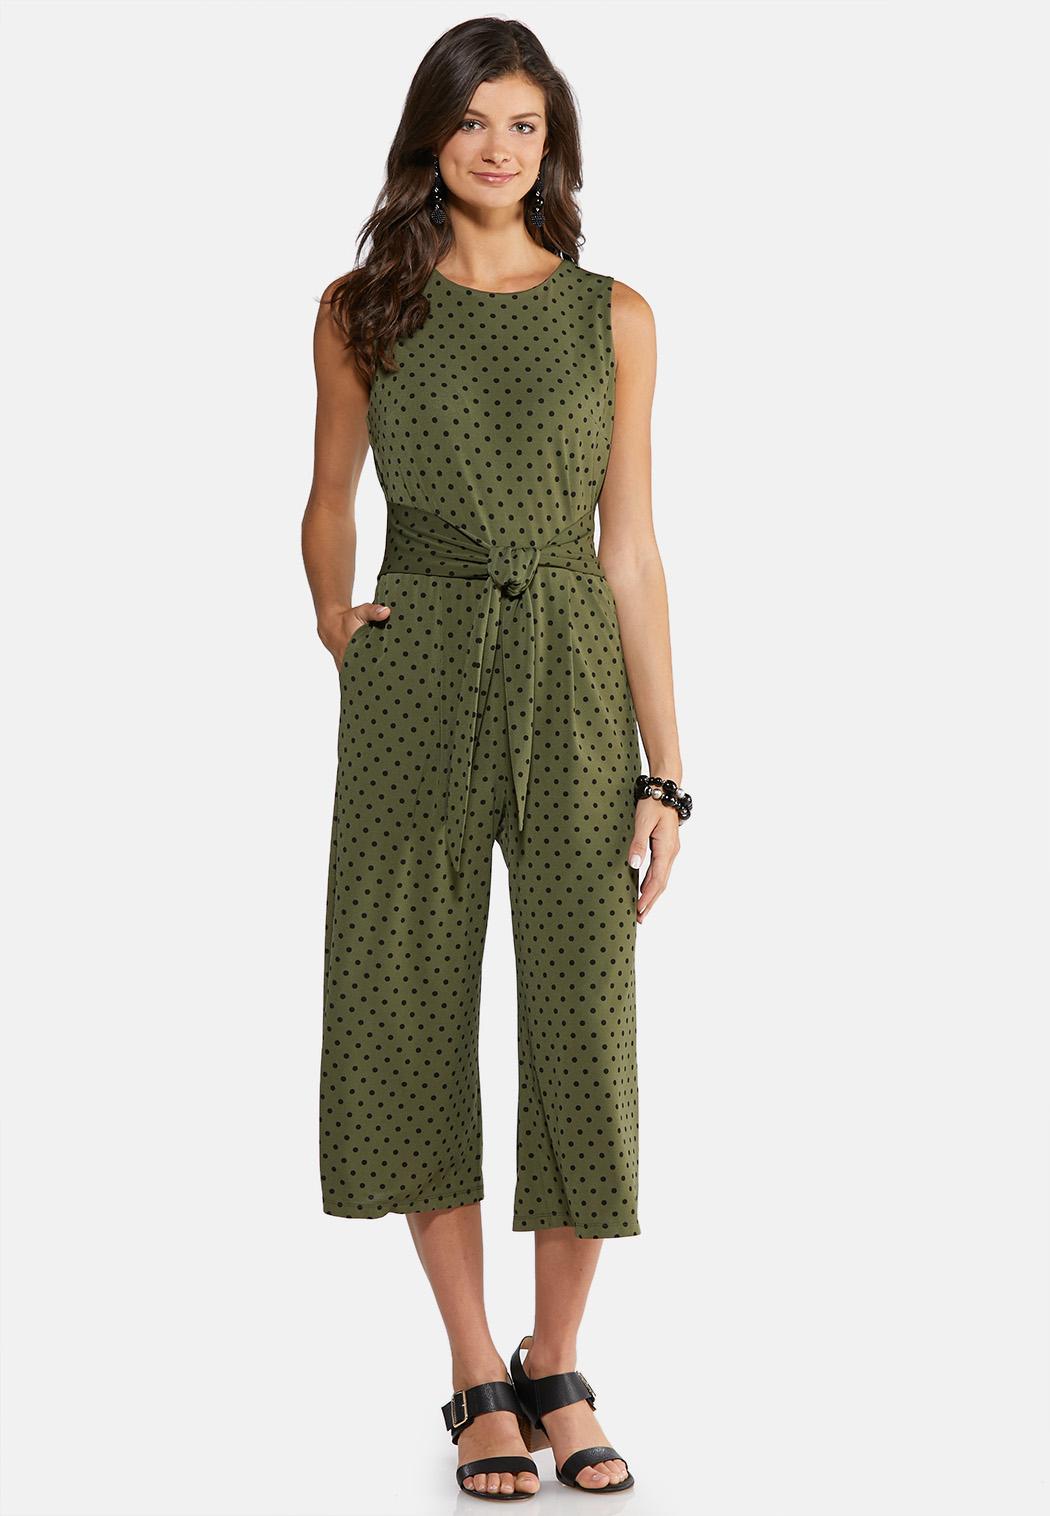 Plus Size Polka Dot Cropped Jumpsuit